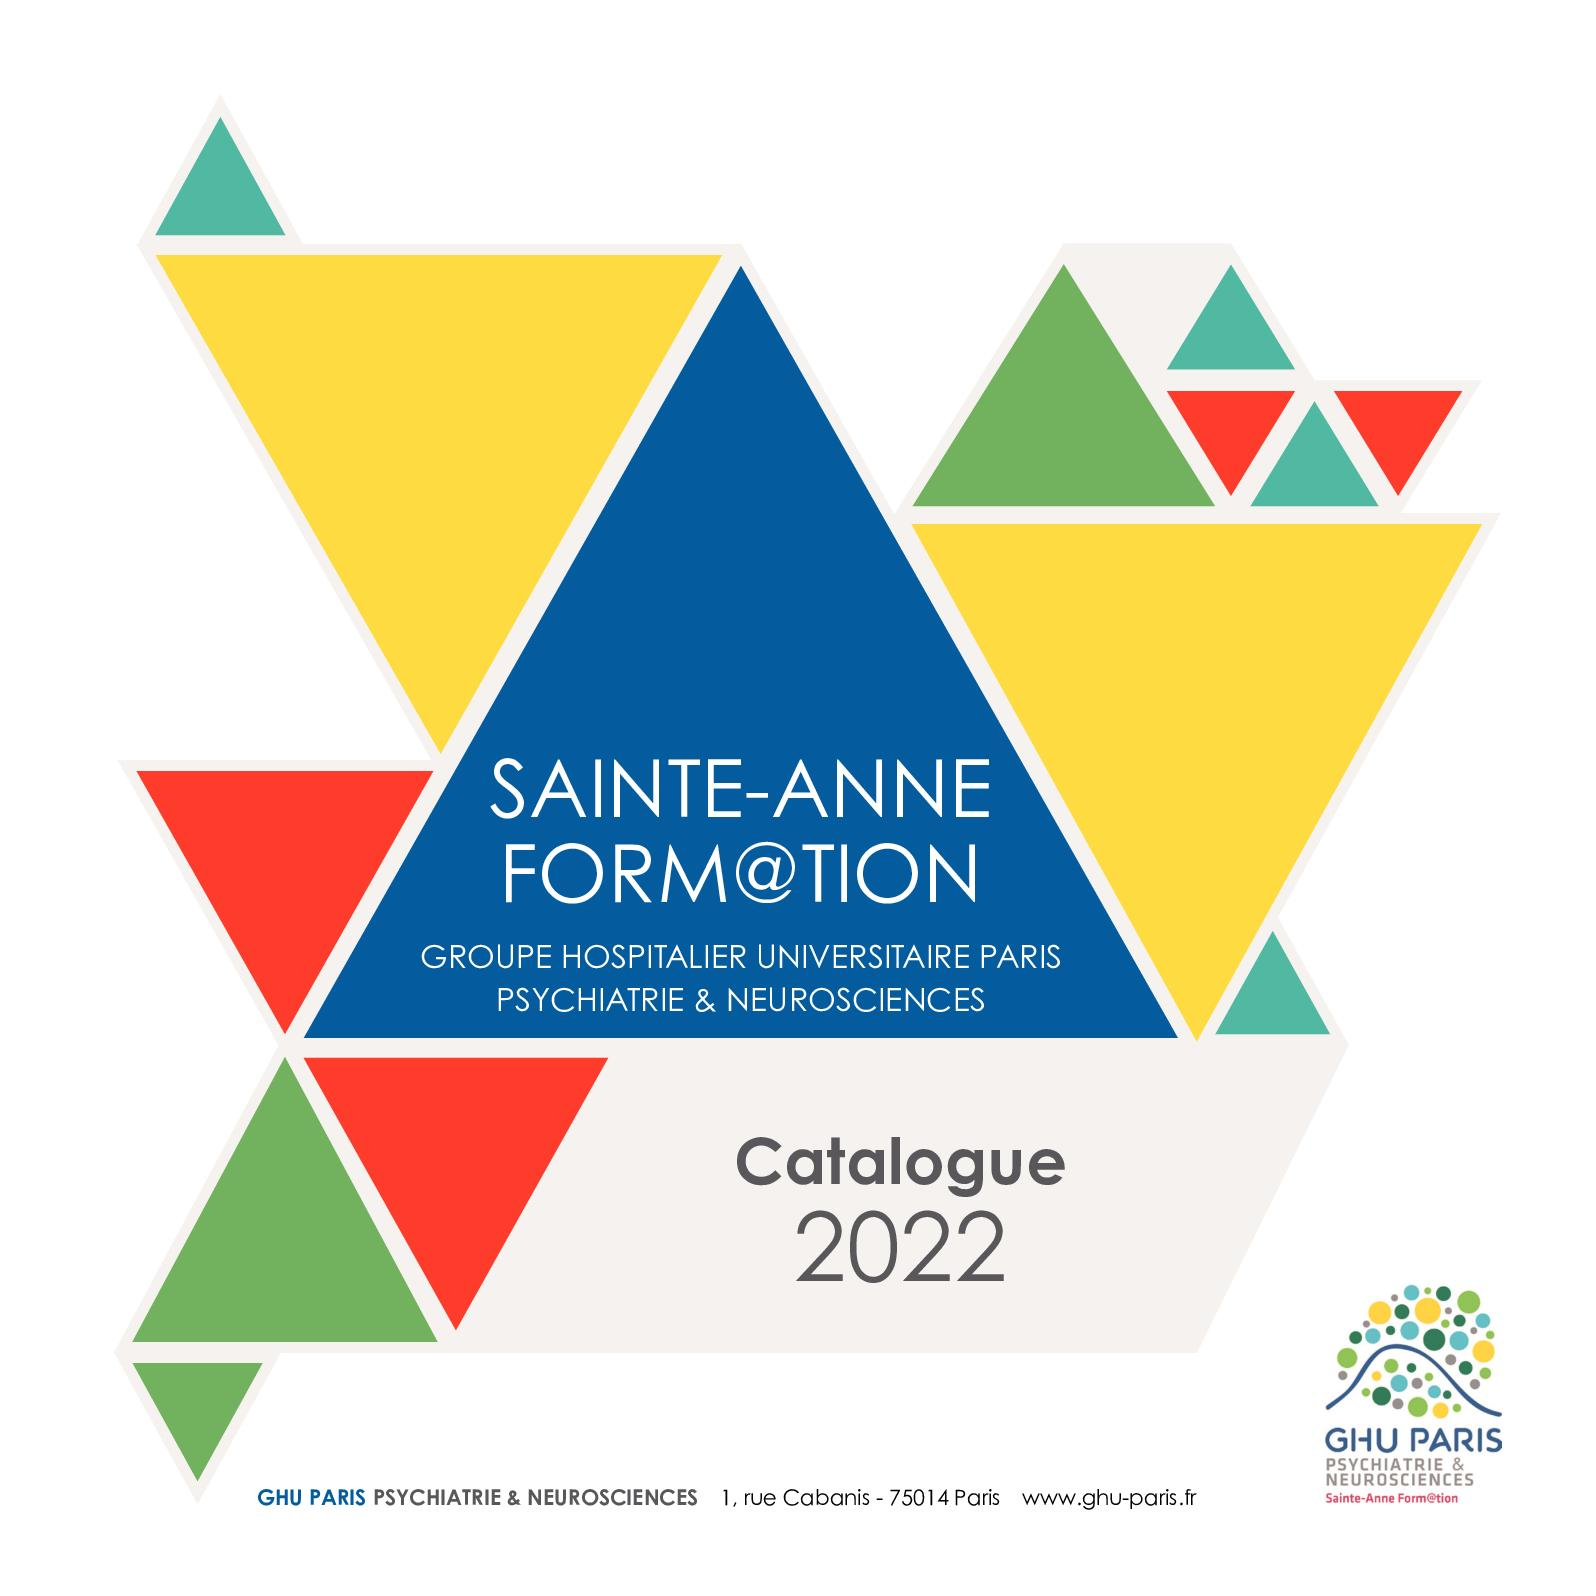 Calendrier Universitaire Paris 13 Villetaneuse 2022 2023 Calaméo   Catalogue 2022